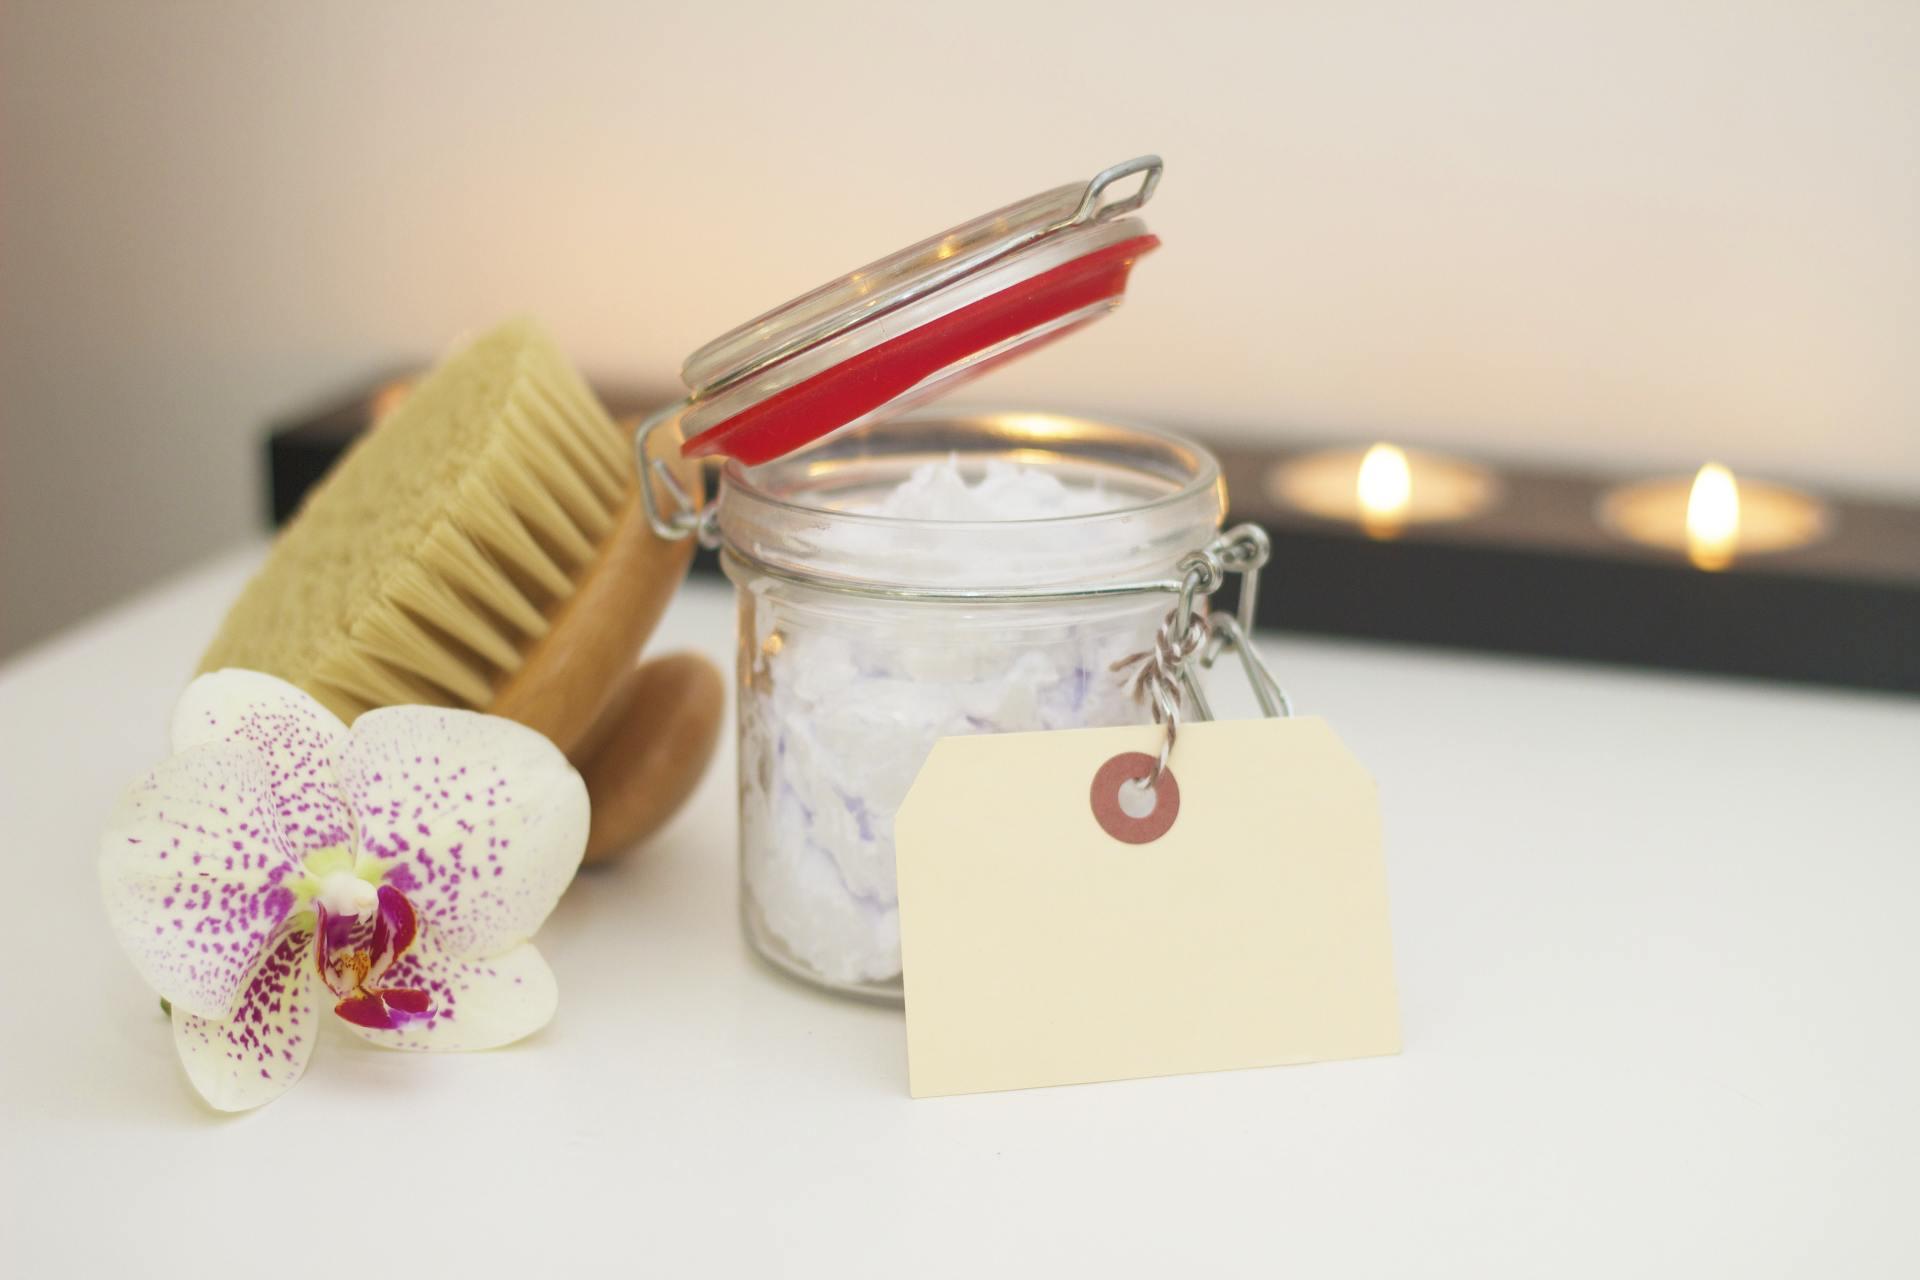 Skin Care + St. Ives